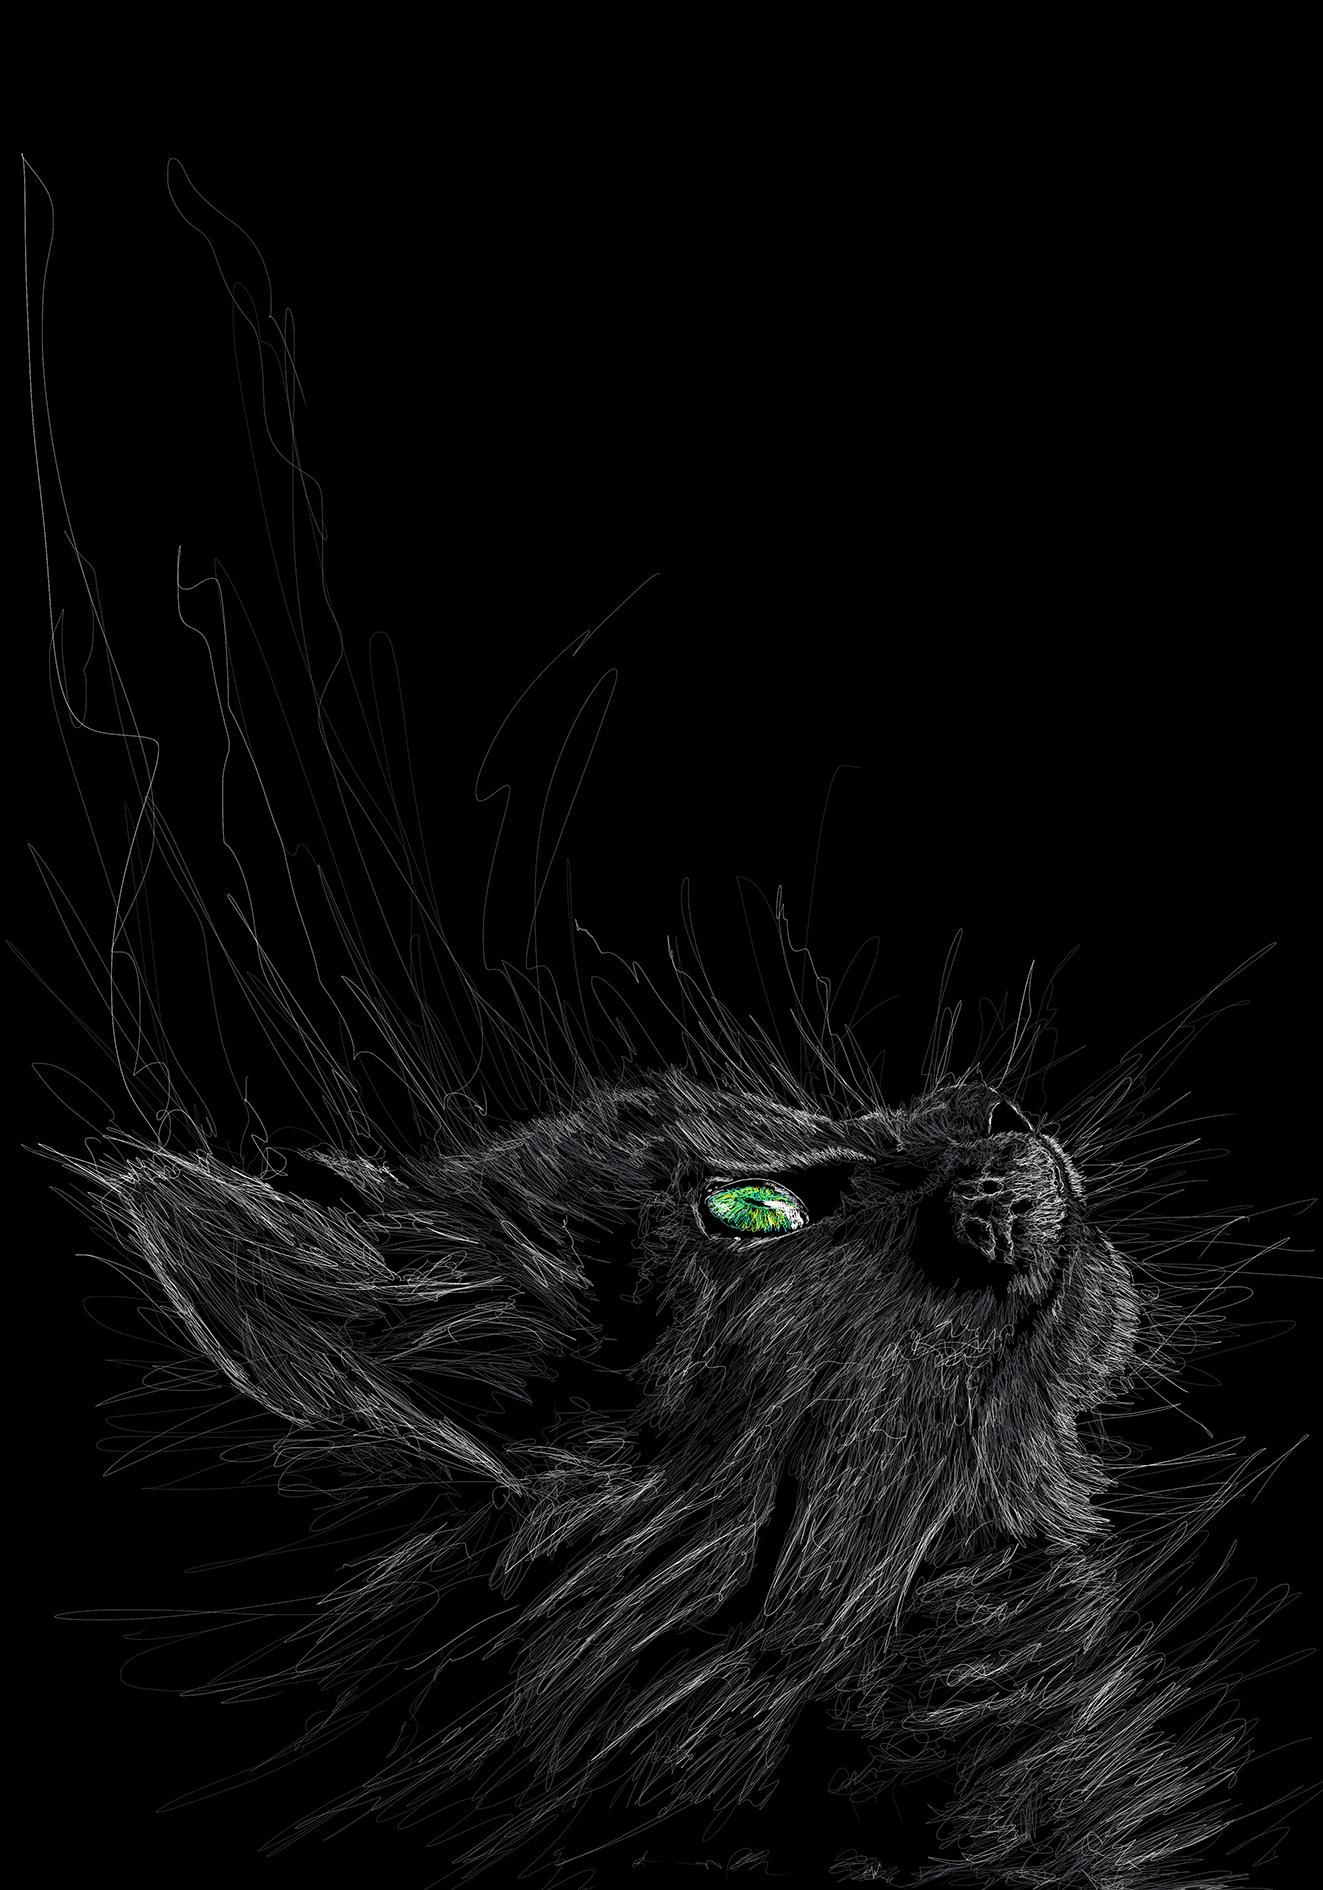 Cat original_Compressed.png